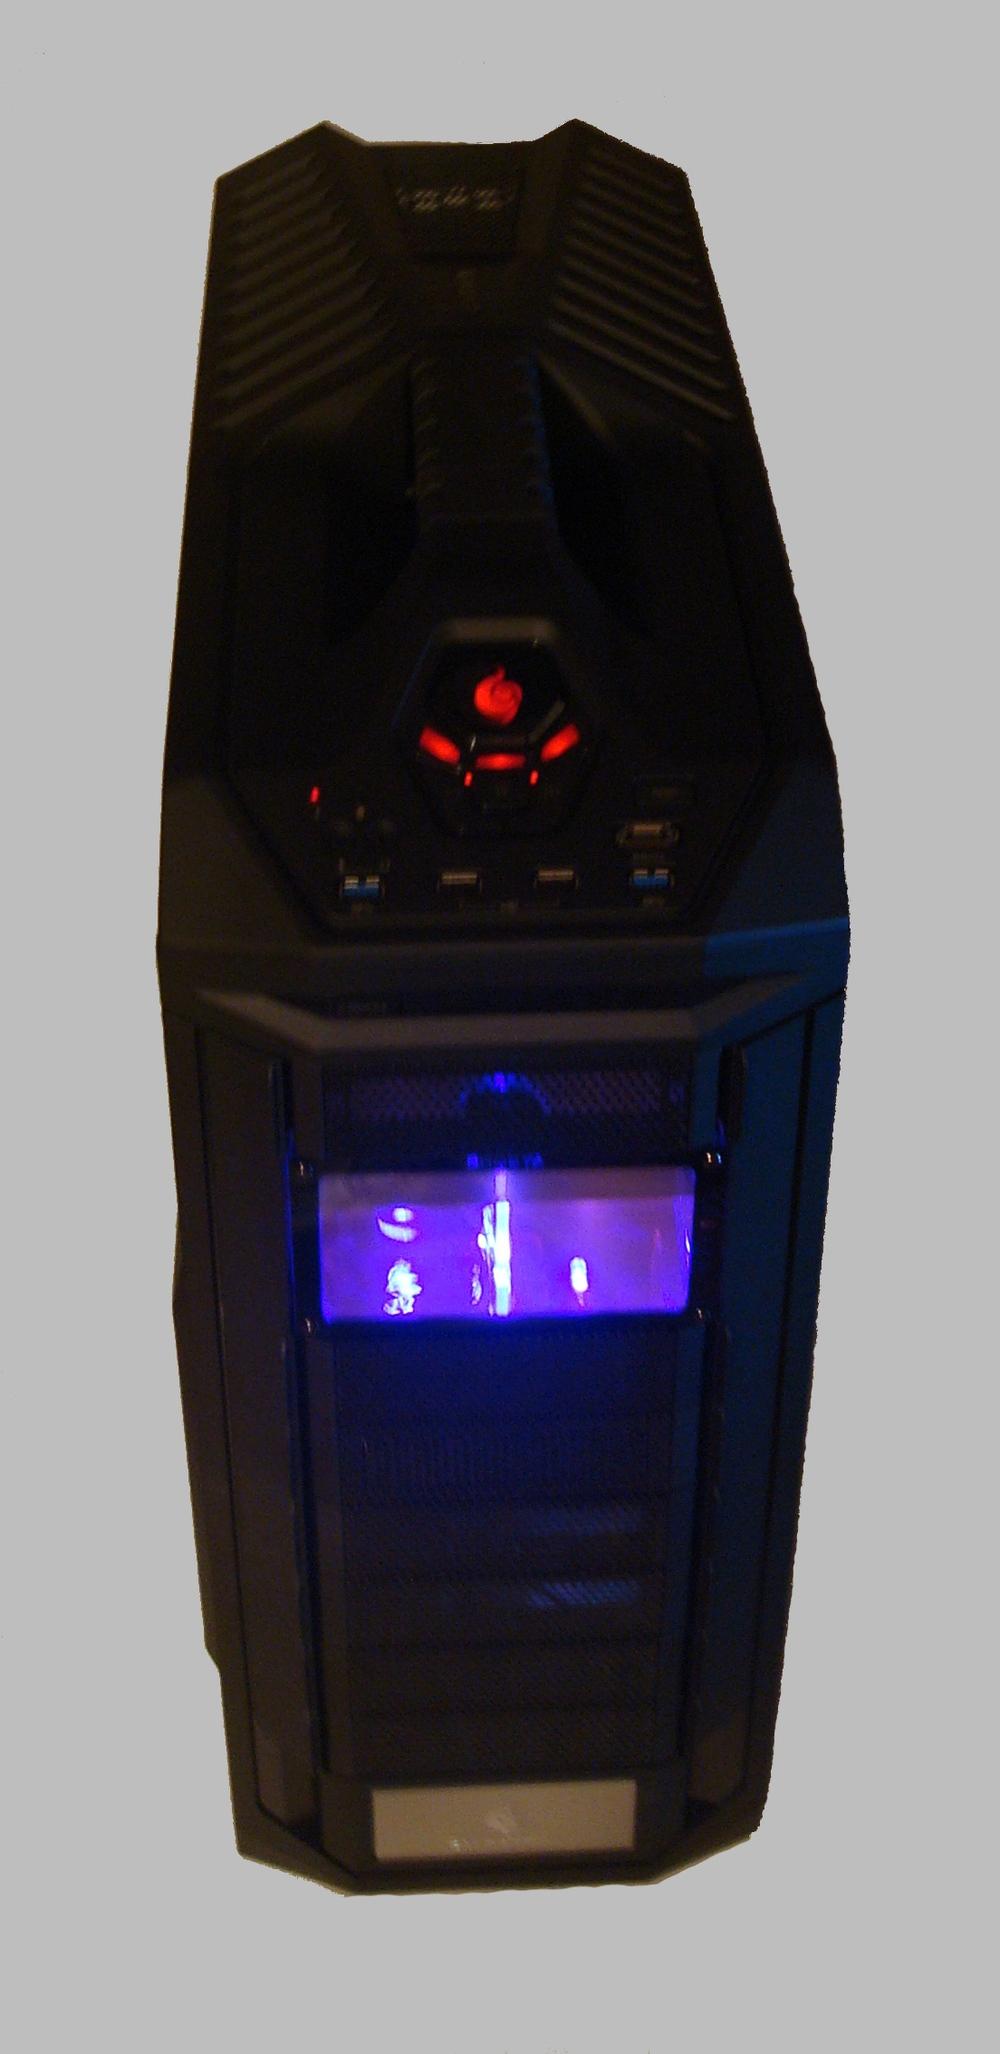 Mojo Games Studios Water Cooled Gaming PC